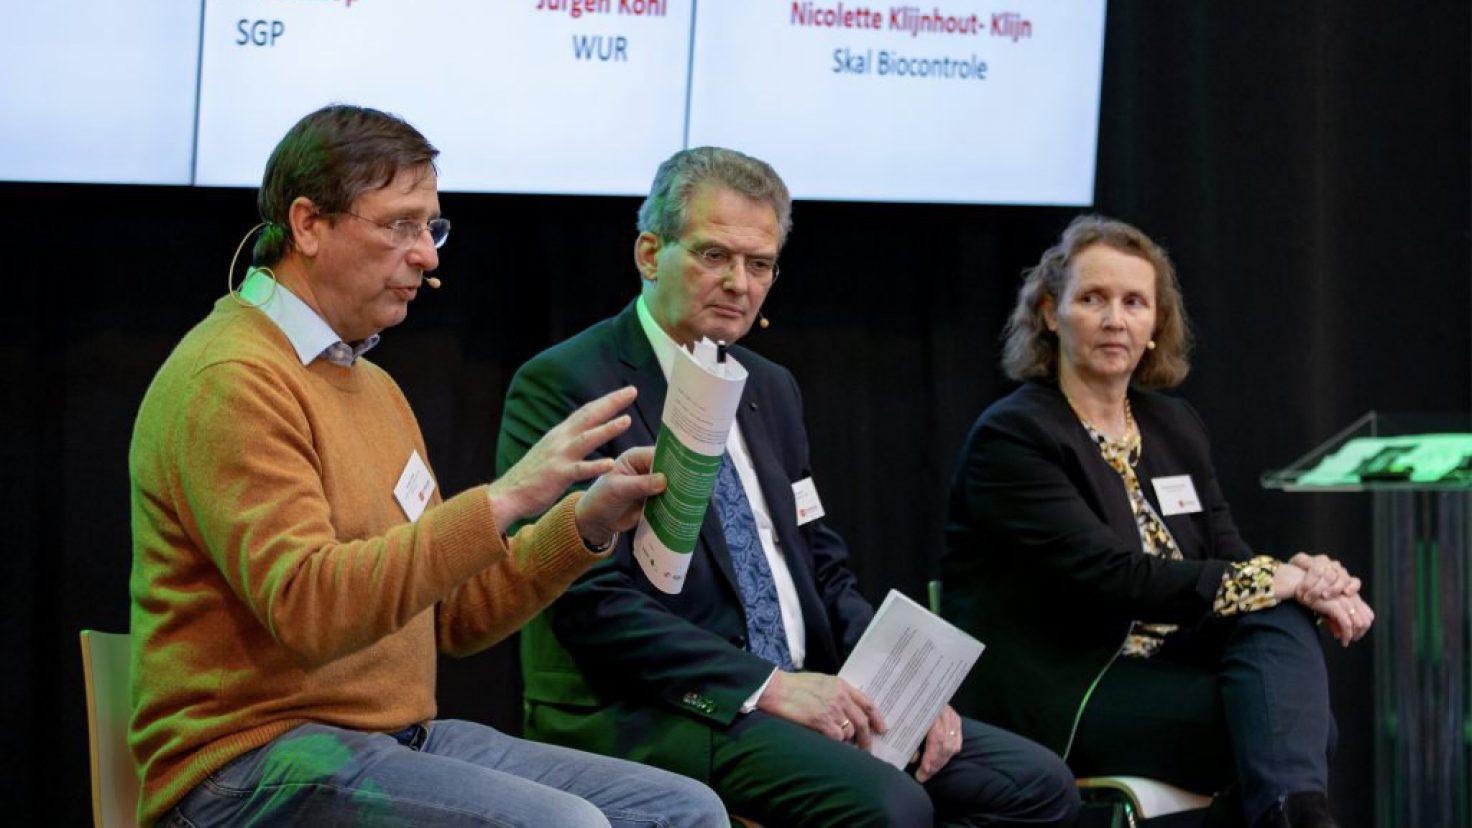 https://landbouwzonderchemiehoedan.nl/files/visuals/_newsBig/Koehl_Bisschop_Klijn_LZCH20_1024_617_84_c1.jpg